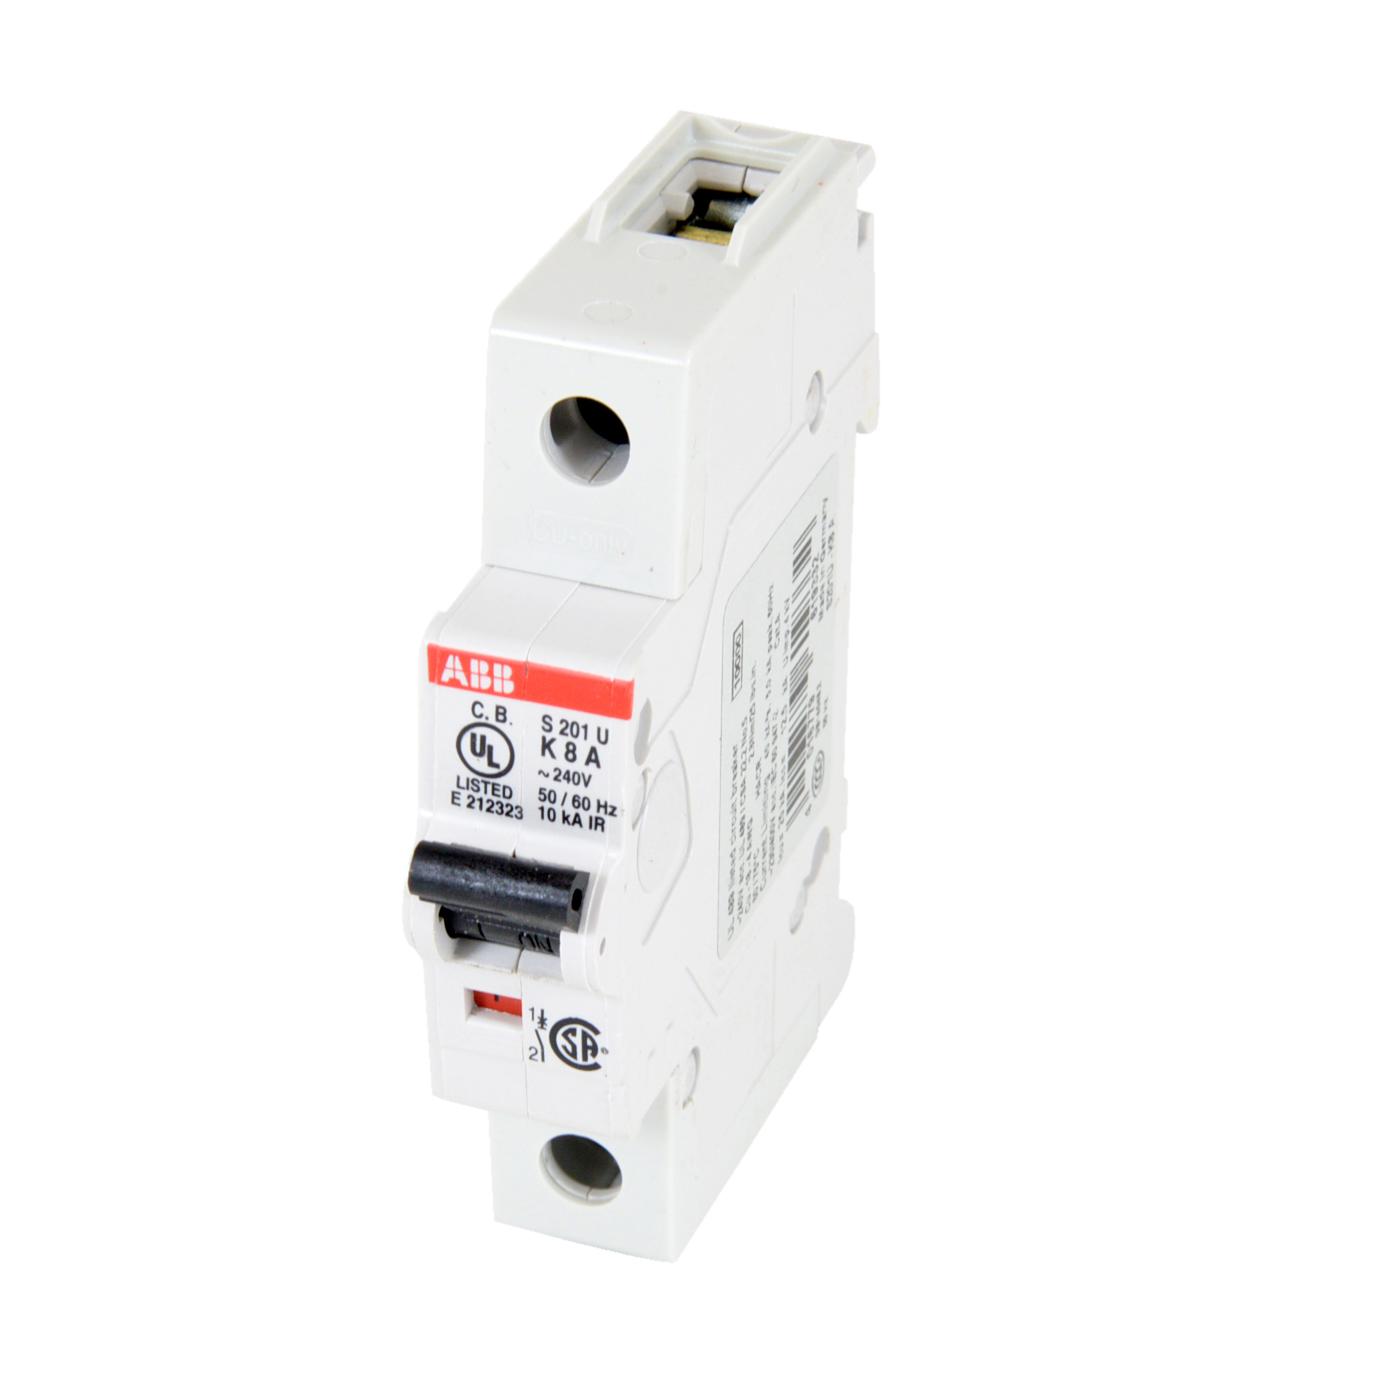 ABB S201U-K8 Miniature Circuit Breaker, 8 Amps, 240V AC. K - Curve. 10 kAIC. S200 Series. Branch Circuit Protection. UL 489, CSA C 22.